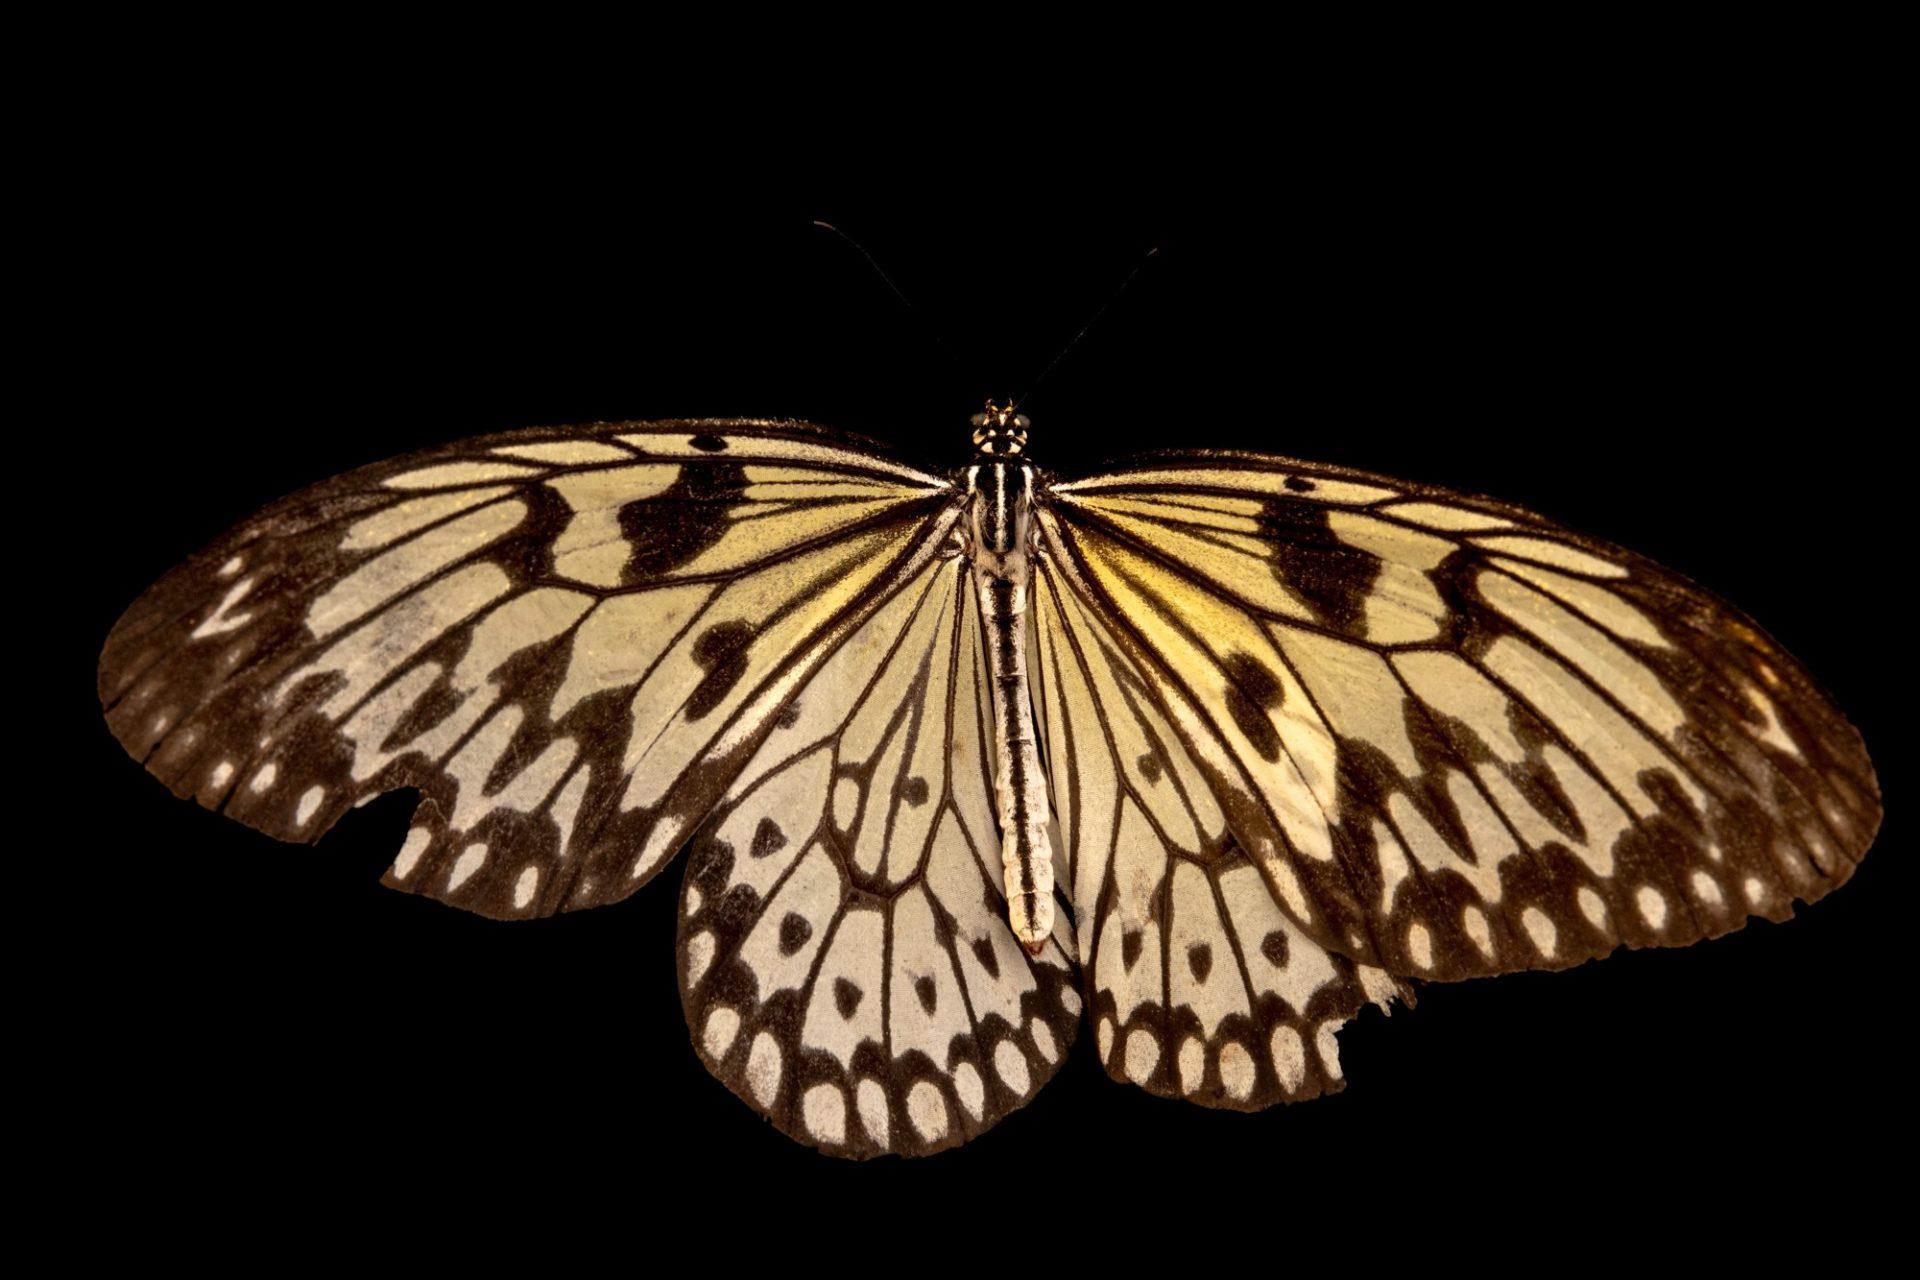 Photo: A paper kite (Idea leuconoe leuconoe) at Davao Butterfly House.